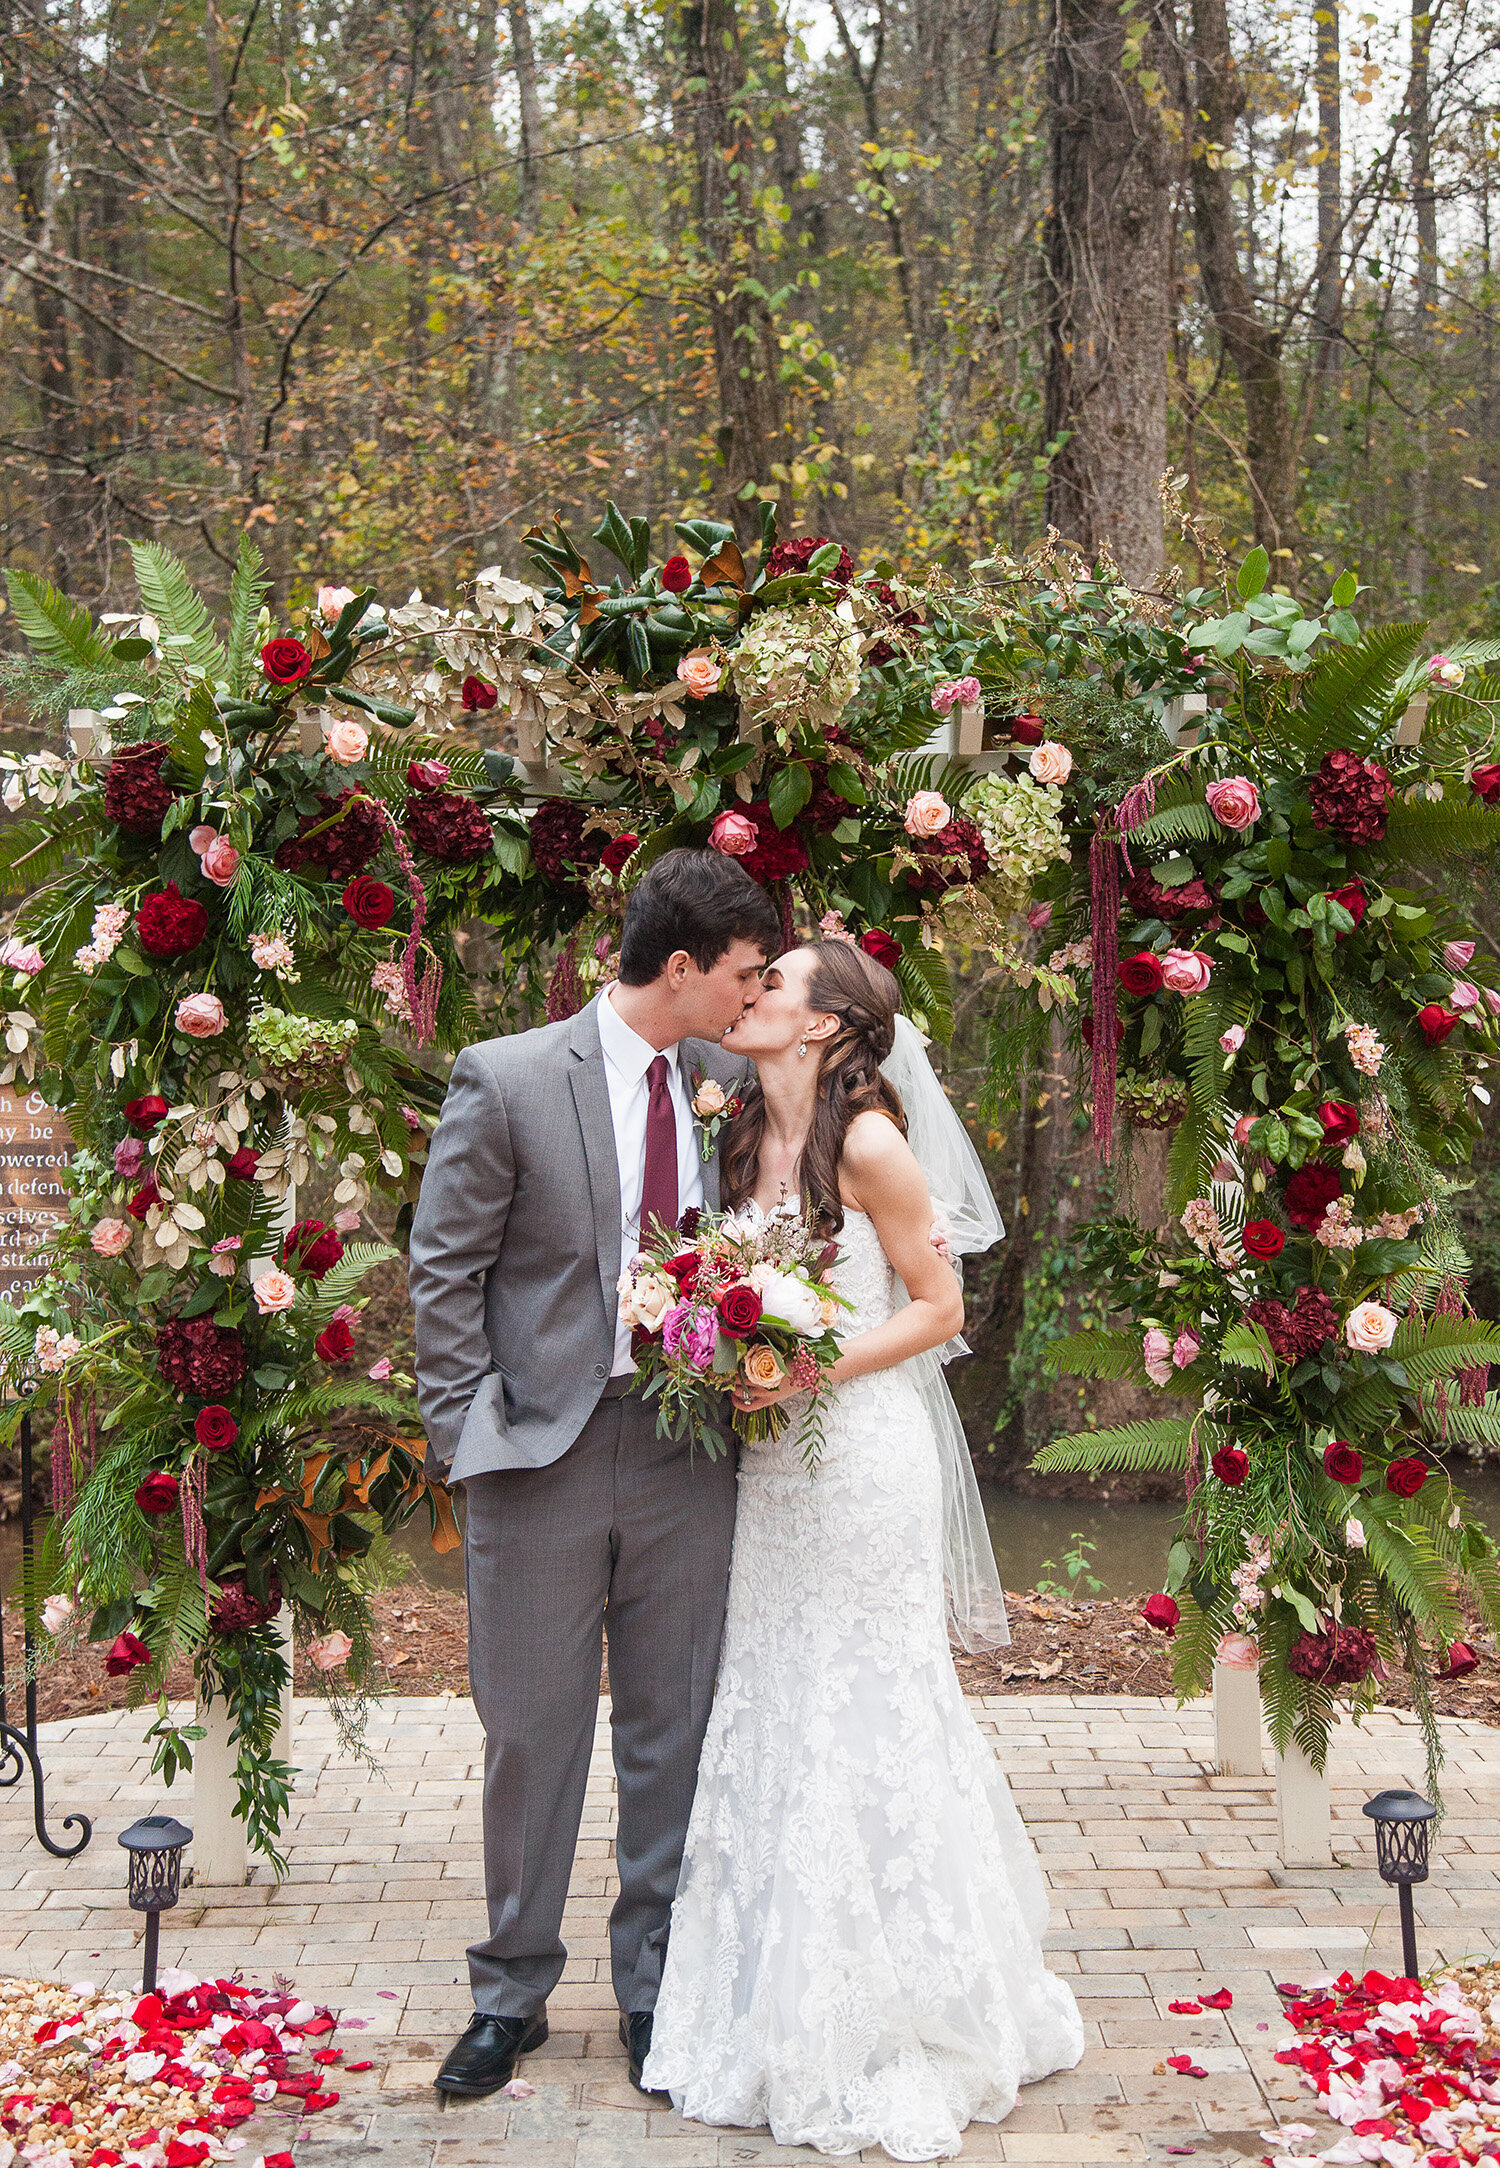 mrandmrsdalton-weddingarch.jpg